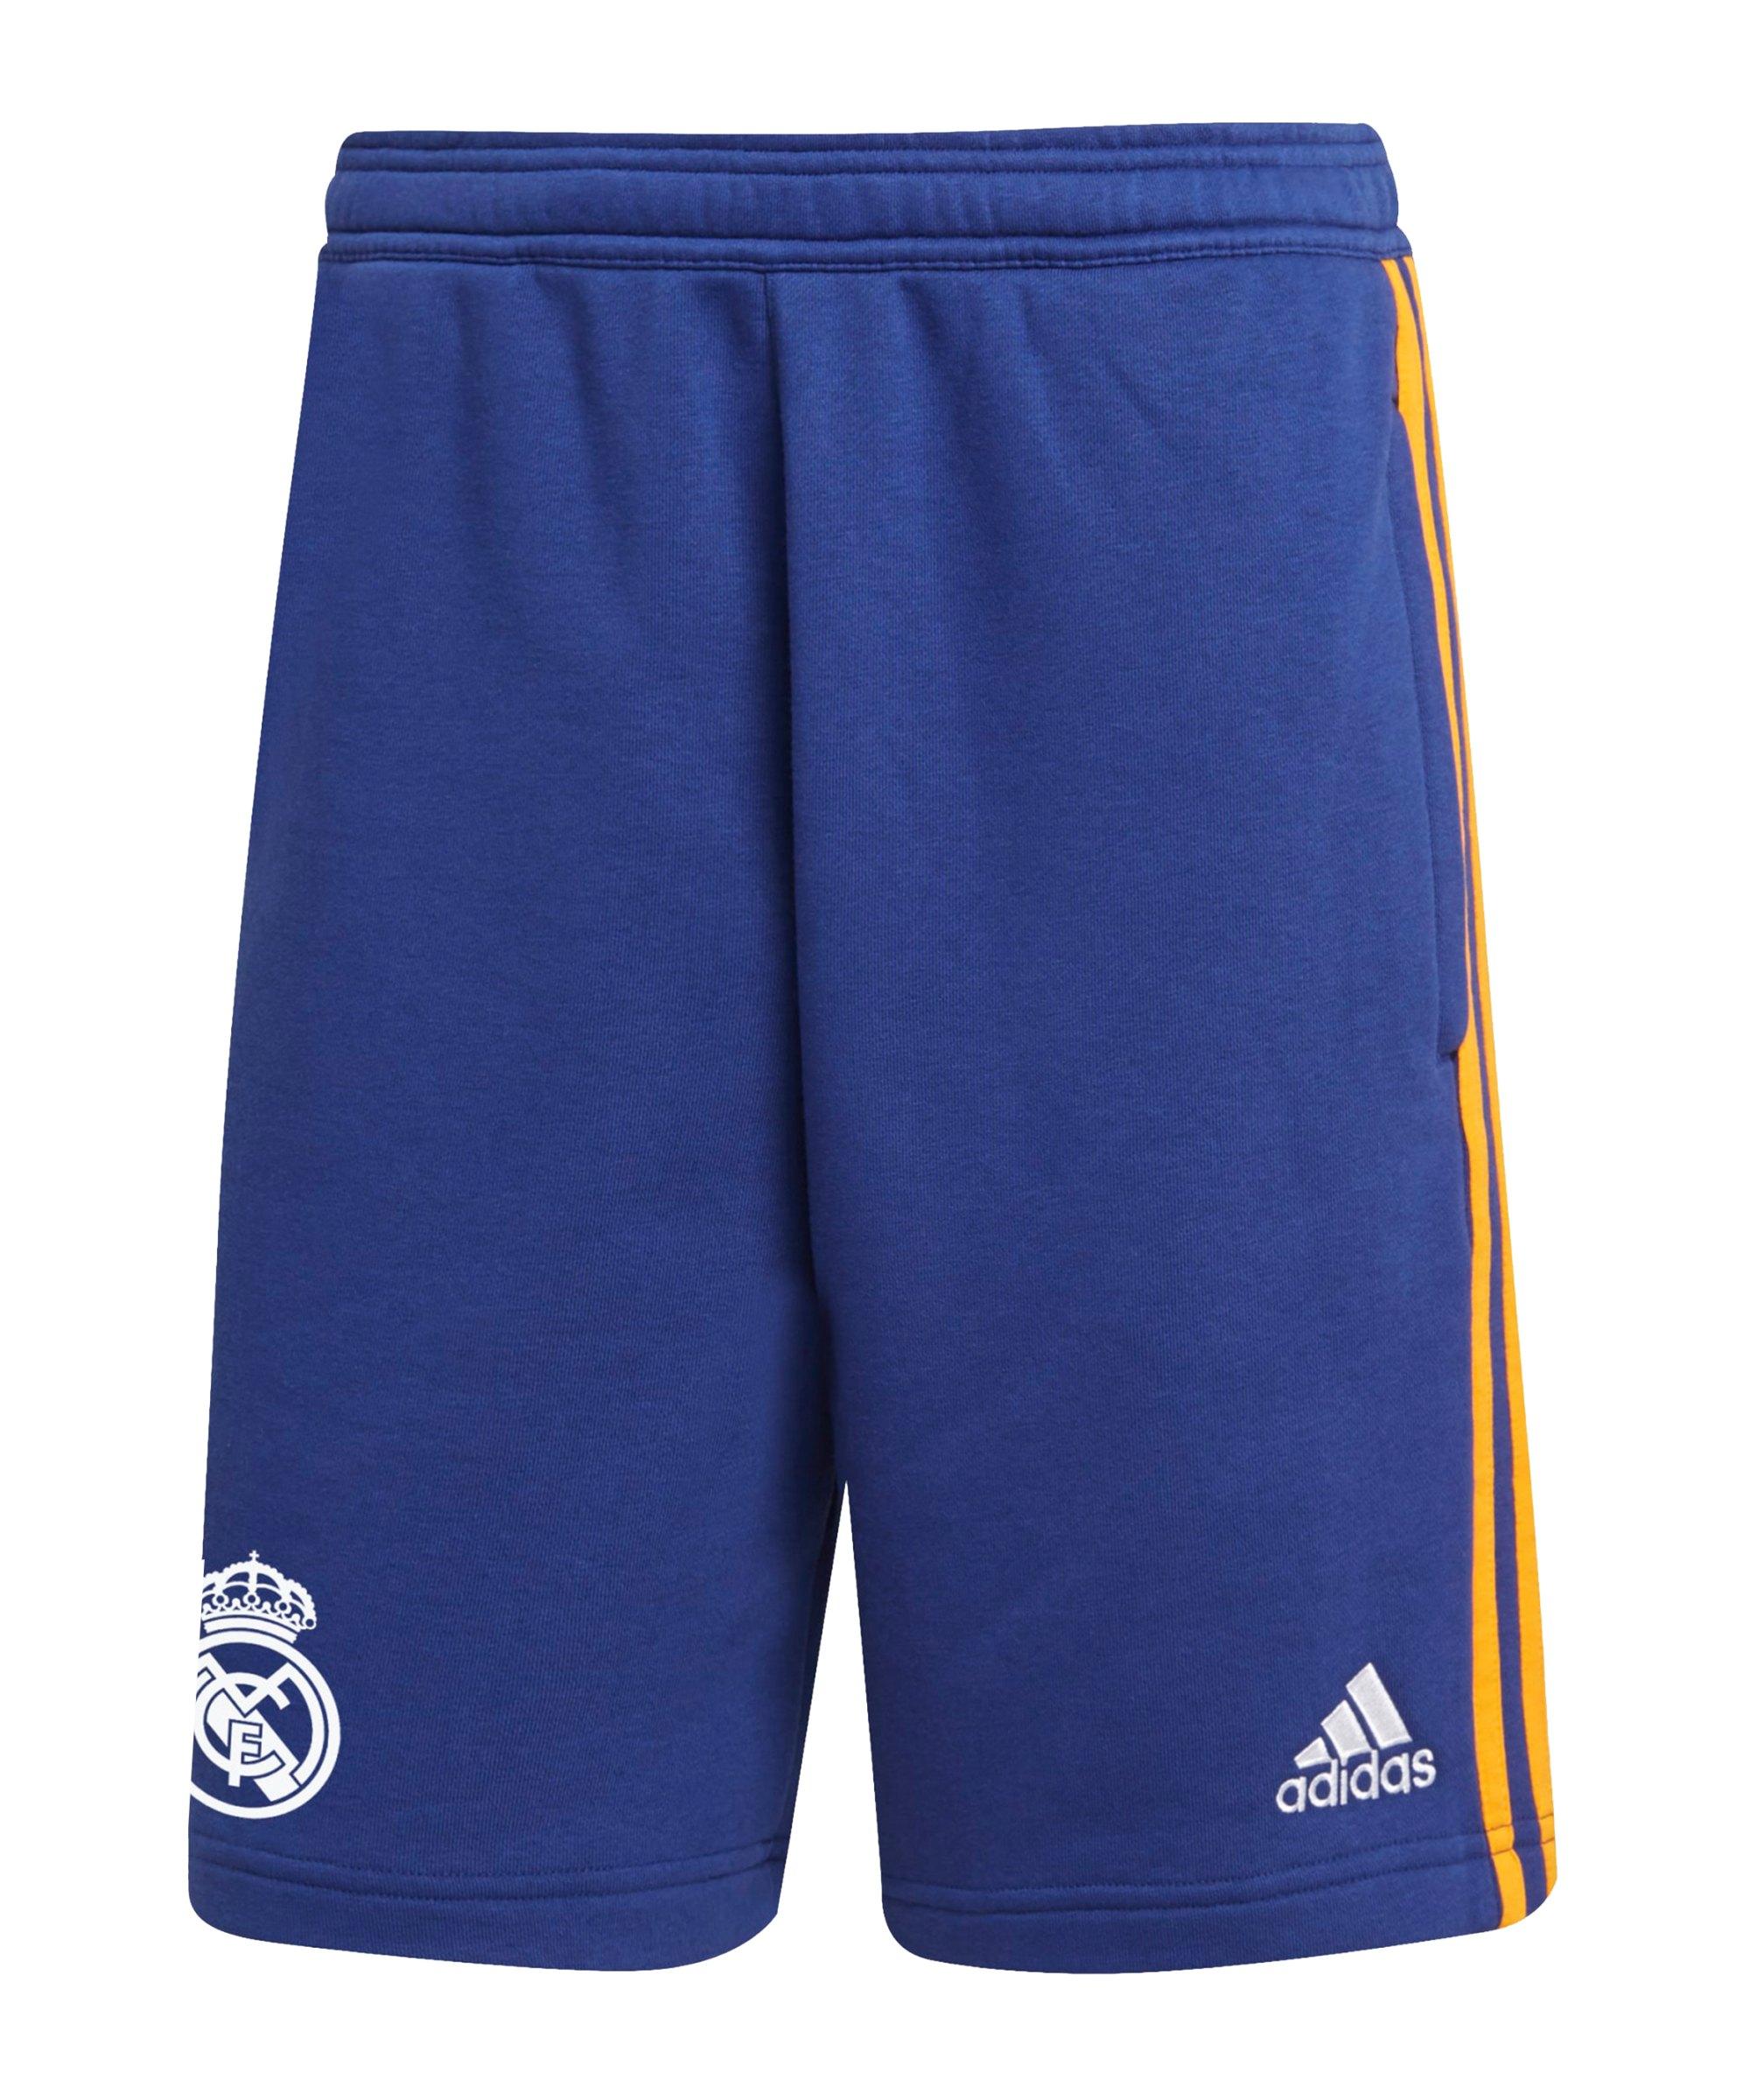 adidas Real Madrid 3S Short Blau - blau